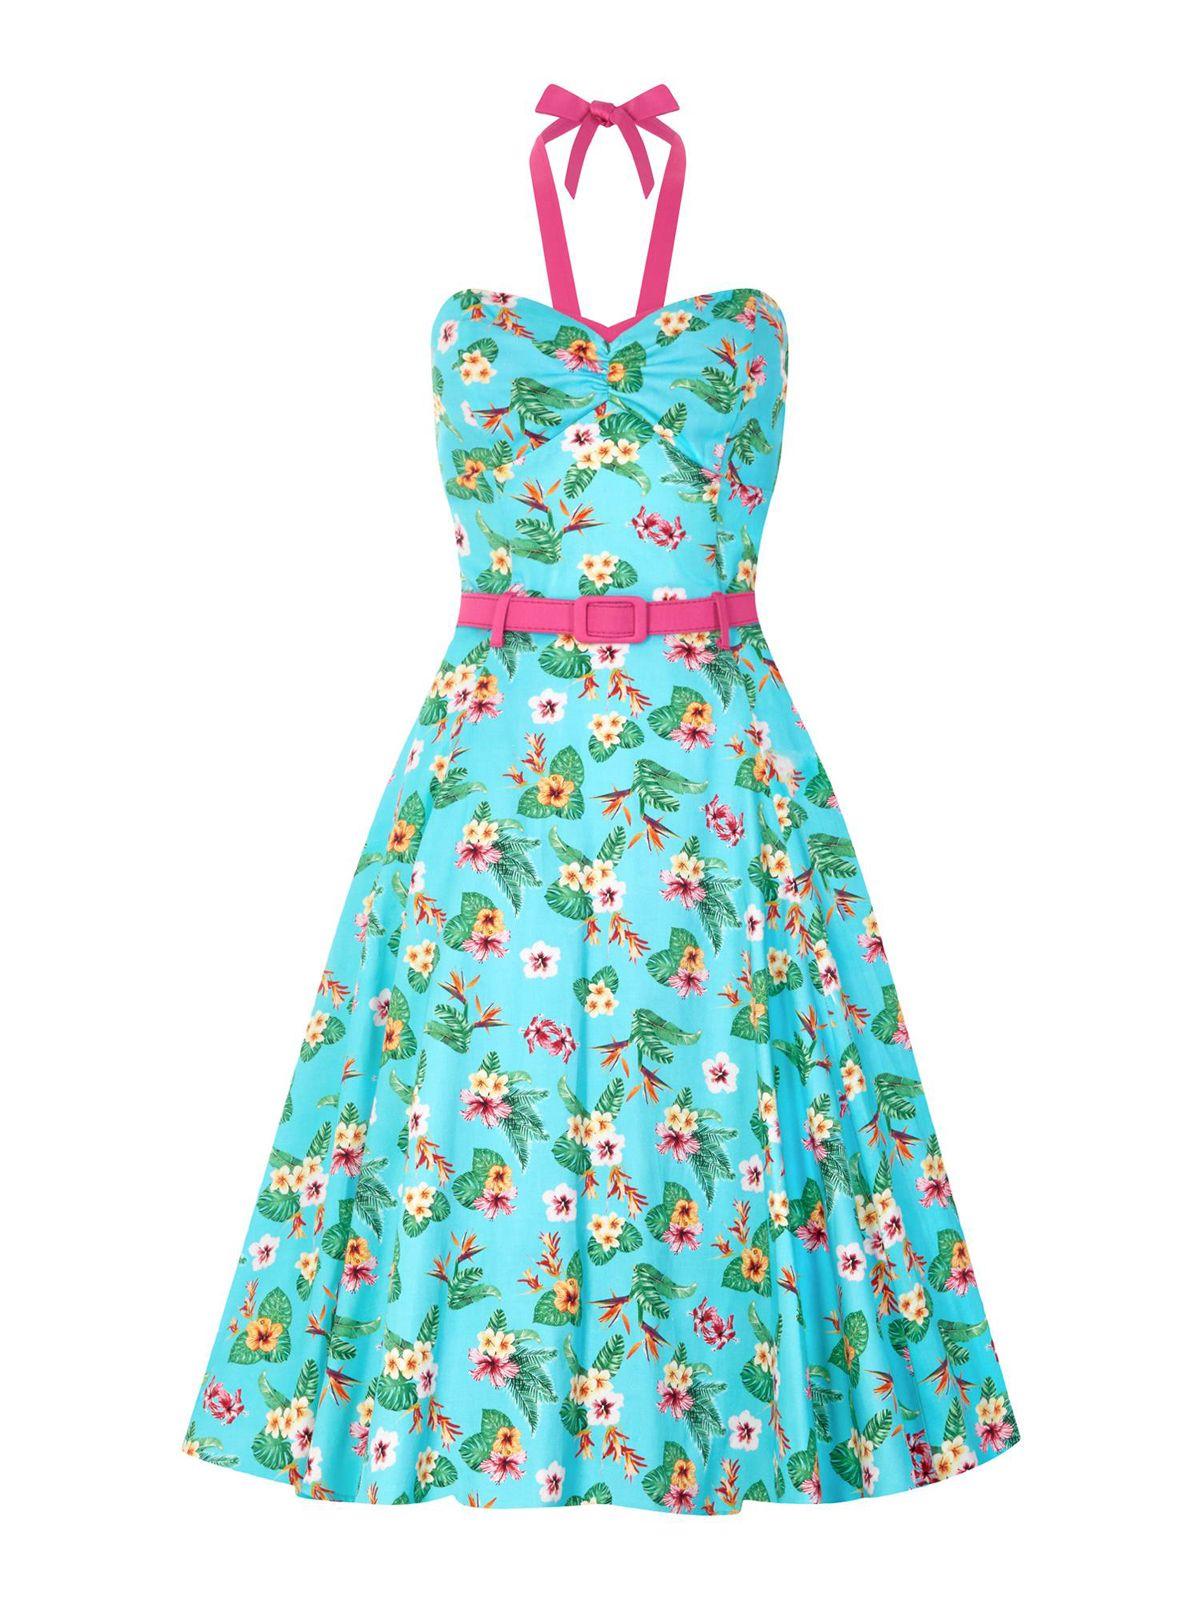 f0f13ff8f53055 Collectif GINGER Paradise HAWAIIAN Doll Vixen SWING Dress KLEID